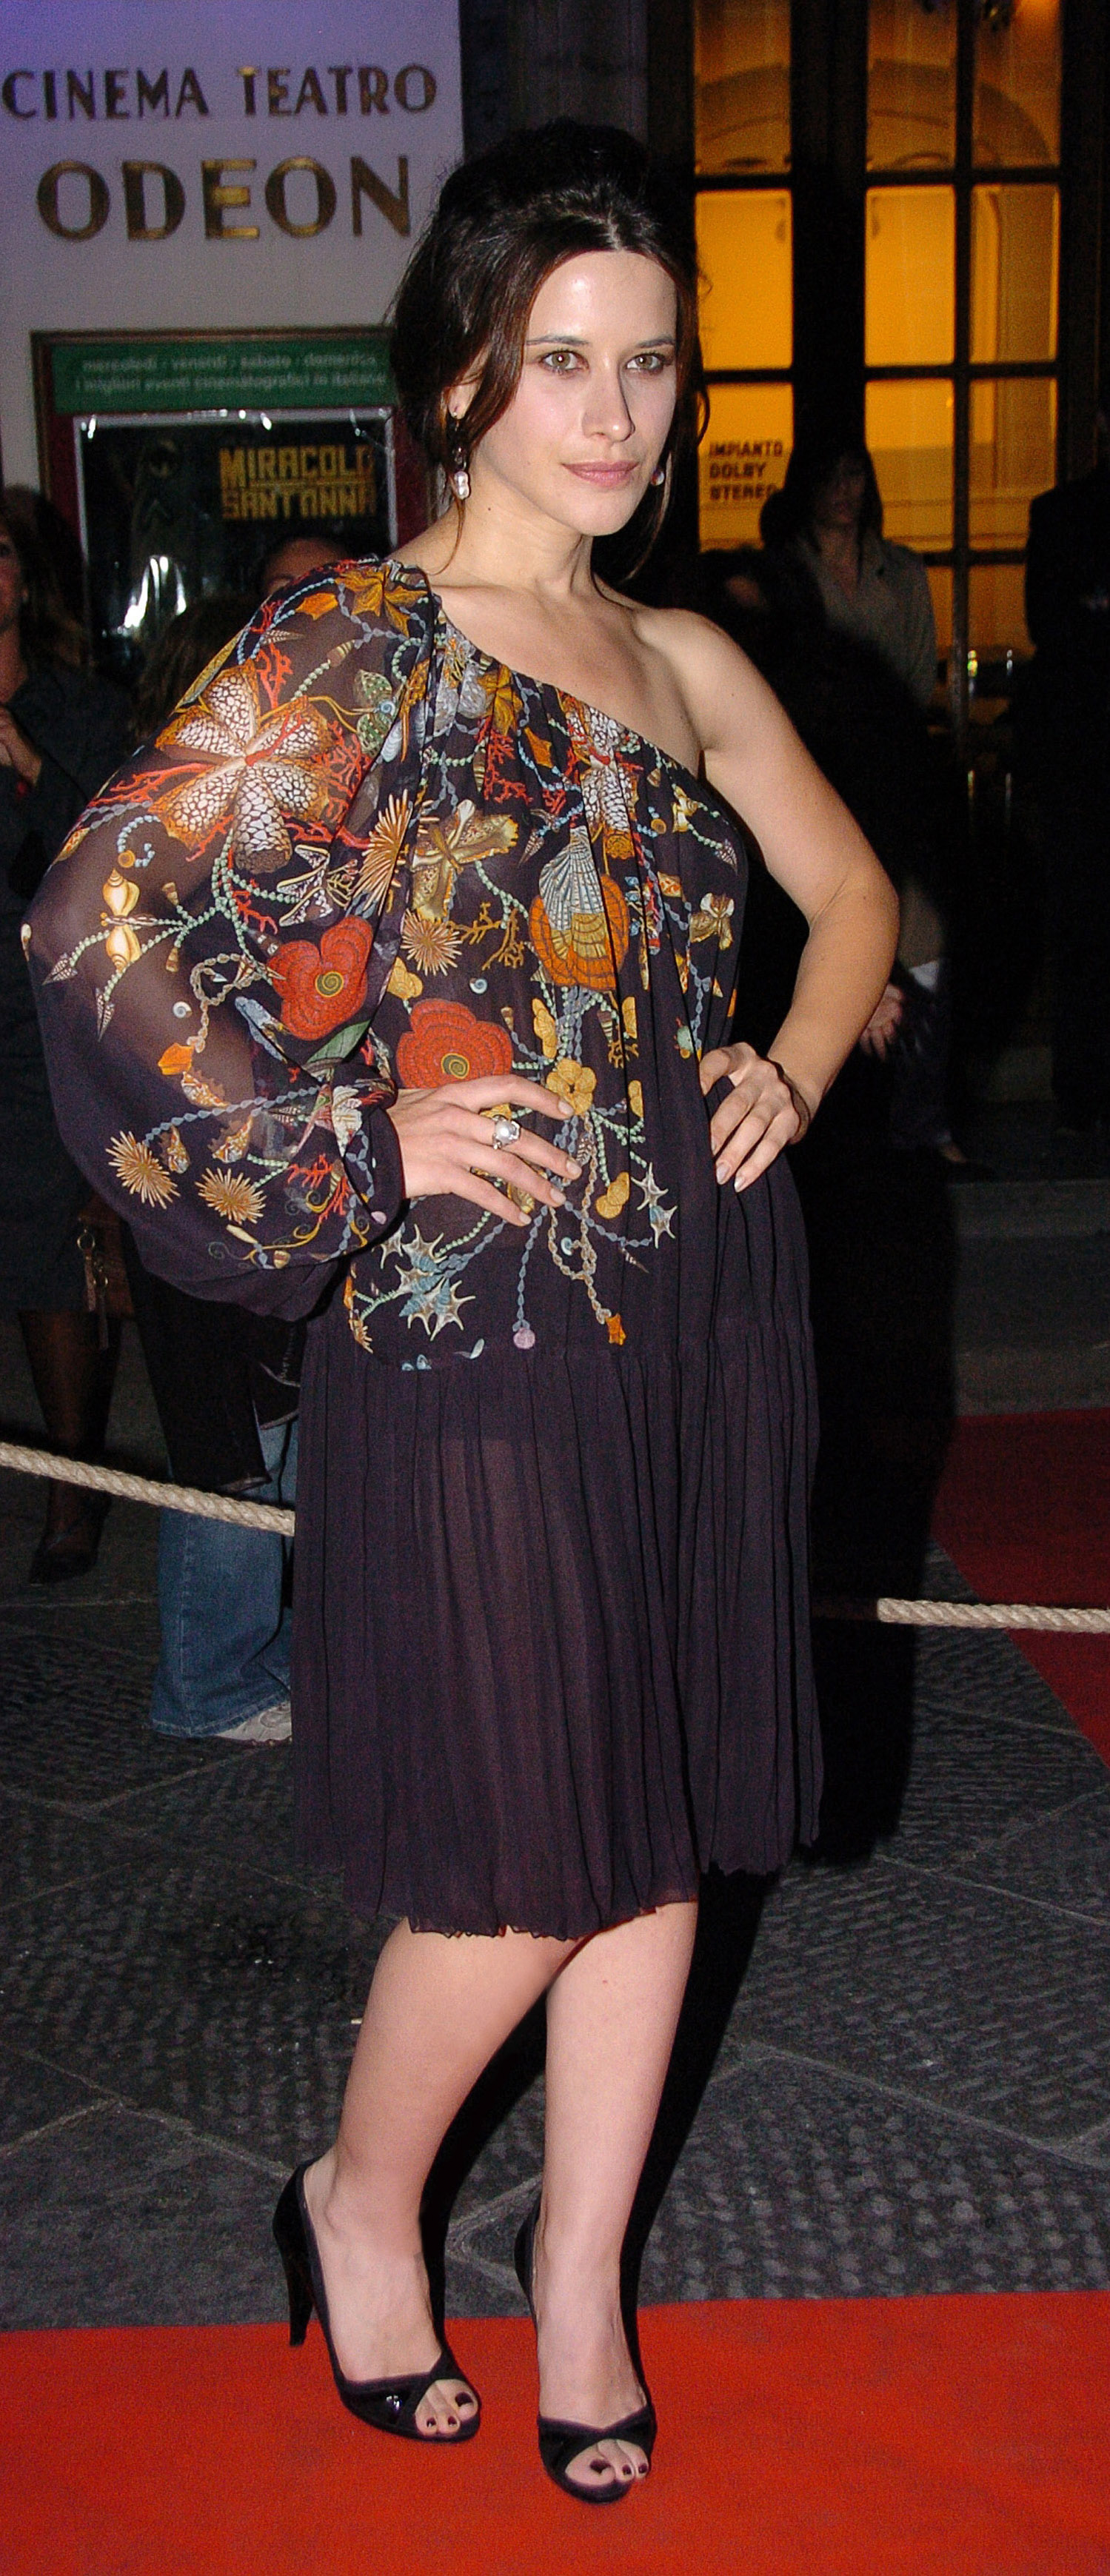 Ashley Hinshaw,Stephane Breton Adult clips Dorothy Fane (actress),Jim Carter (born 1948)